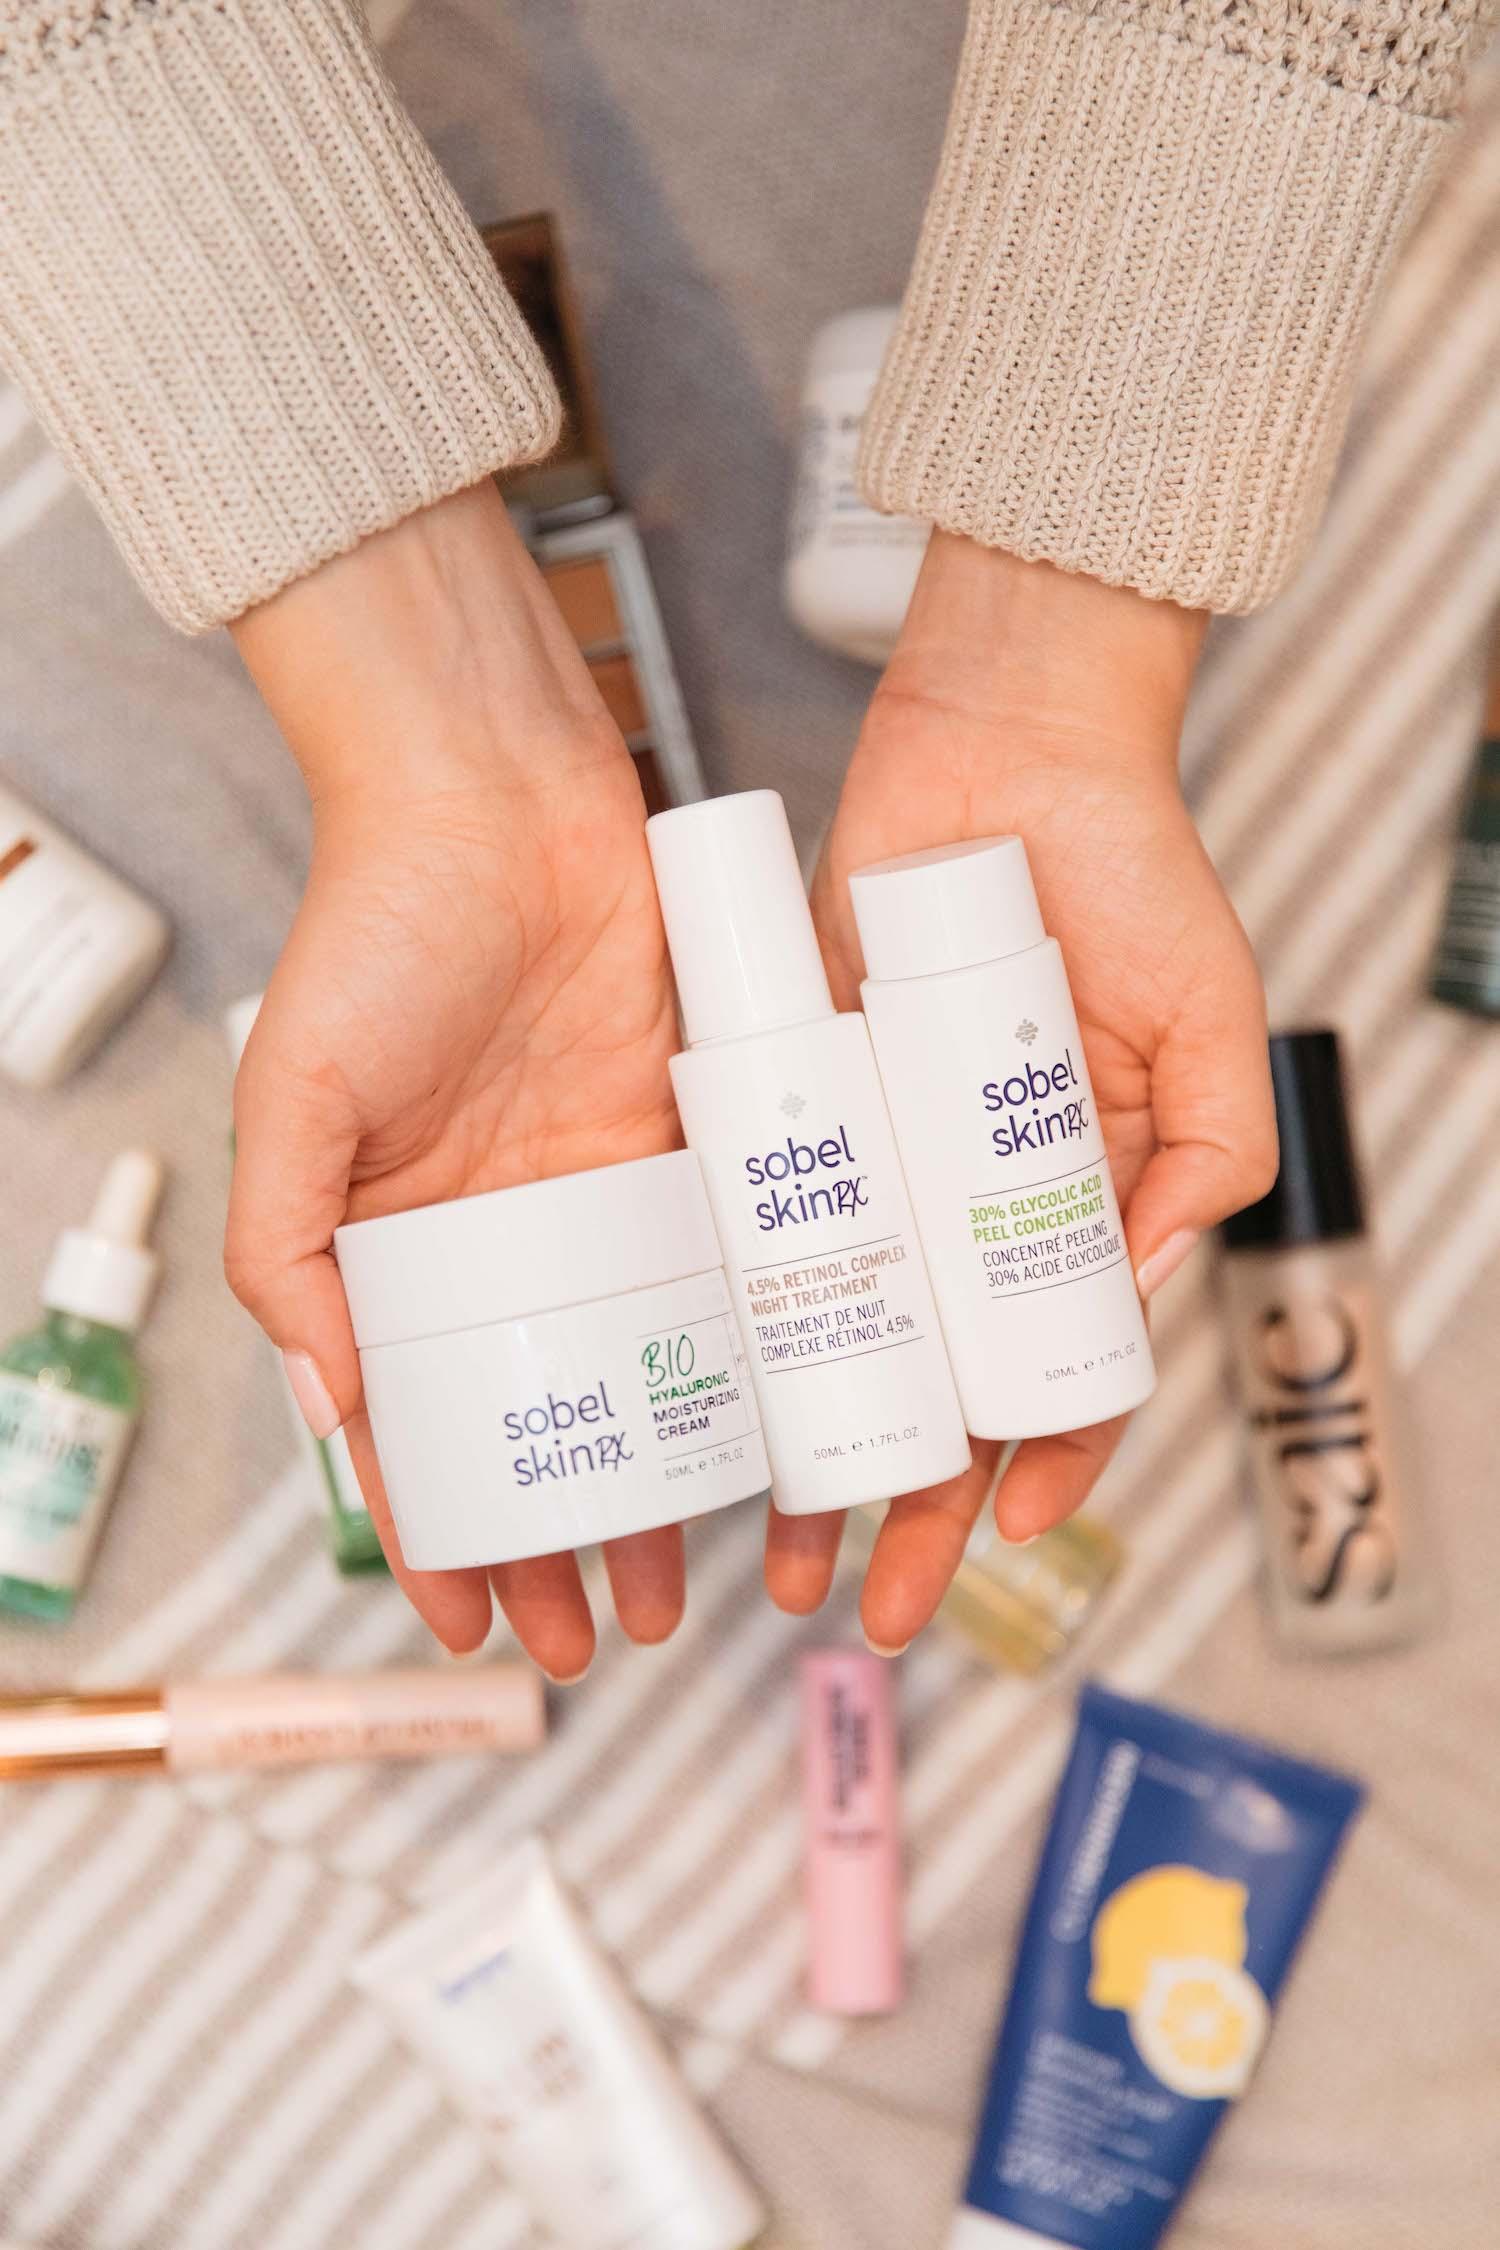 Sobel Skin RX | Sephoras Spring Savings Event 2021